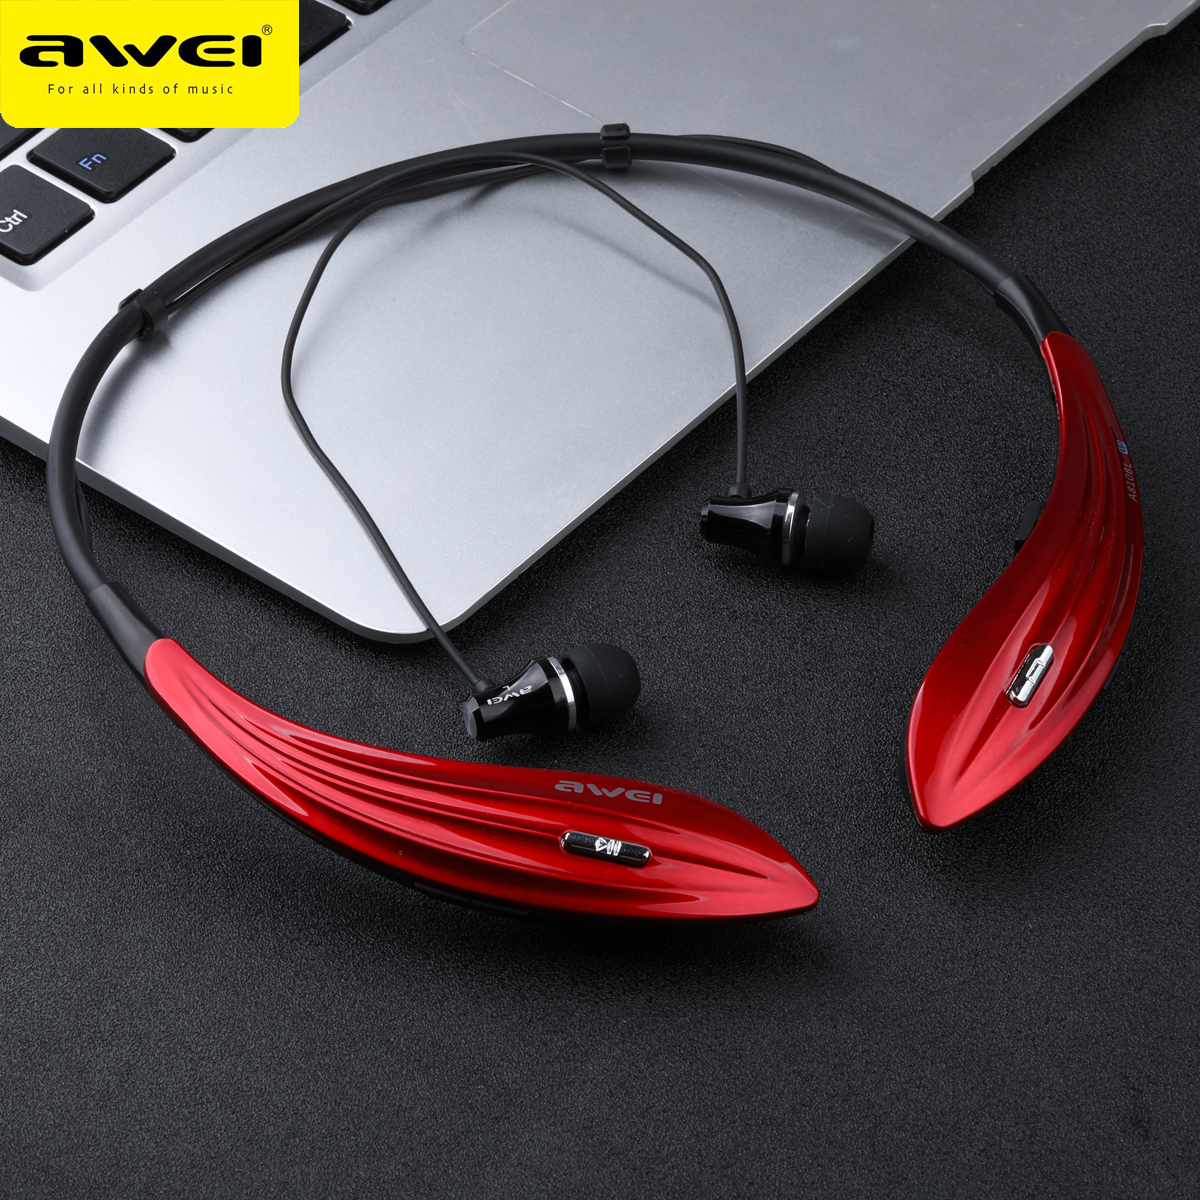 AWEI A810BL Auricolari Bluetooth Cuffia Senza Fili Super Bass Sport Neckband Headset Audifonos kulakl k Bluetooth V4.1 Casque